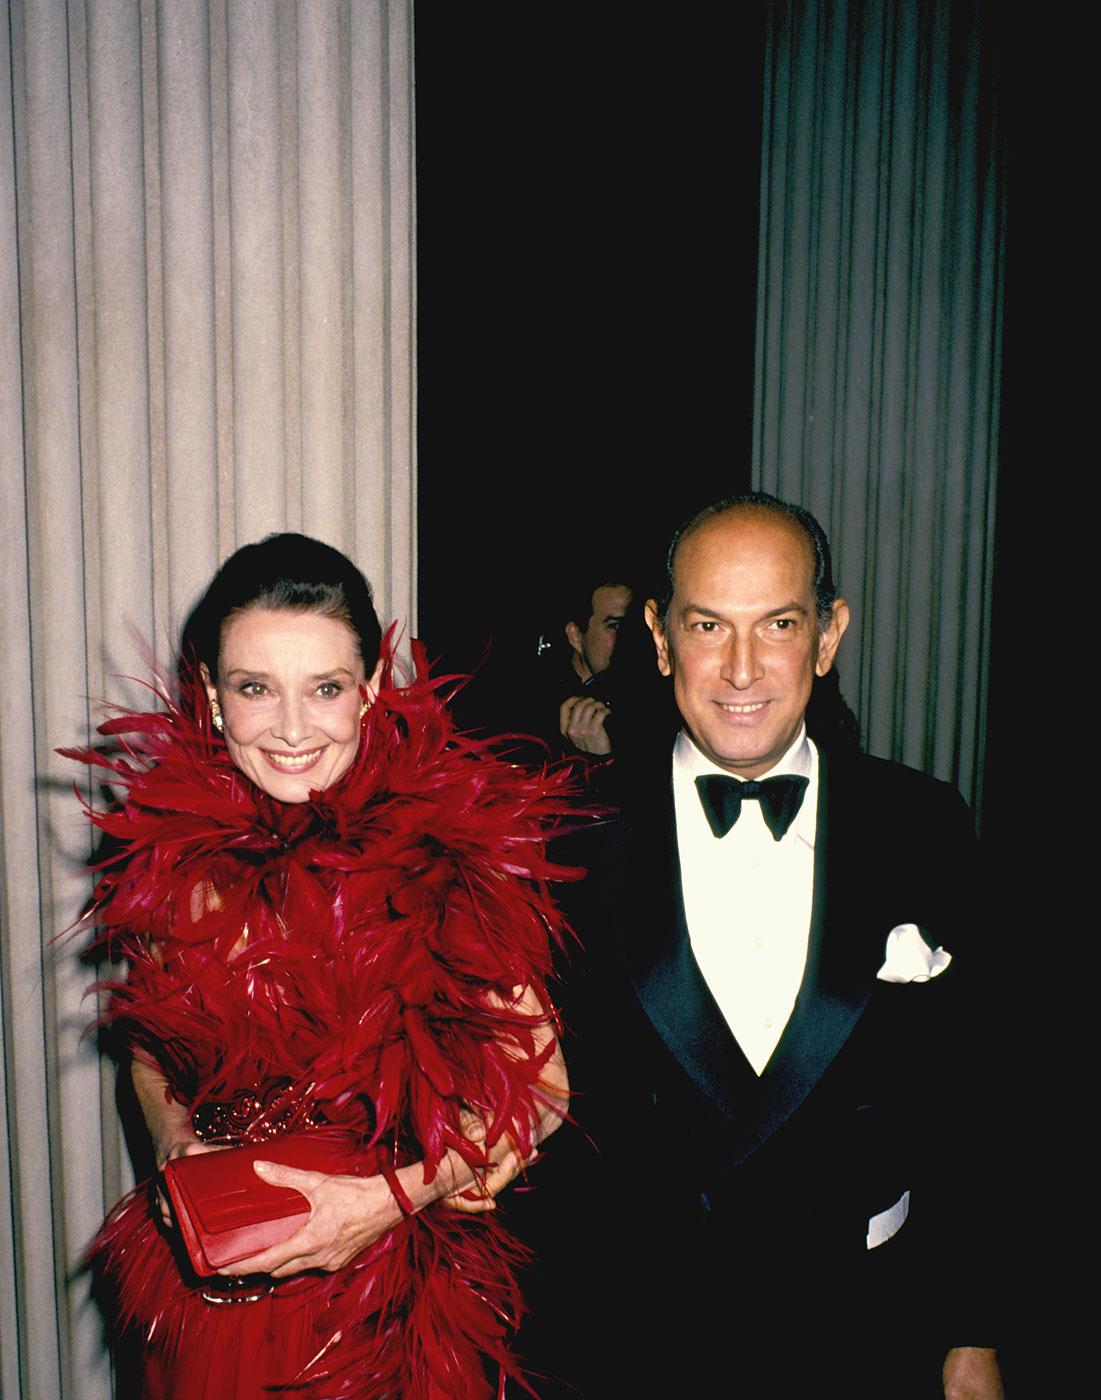 Audrey Hepburn and Oscar de la Renta during the 1988 Council of Fashion Designers of America Awards at Metropolitan Museum of Art in New York City.